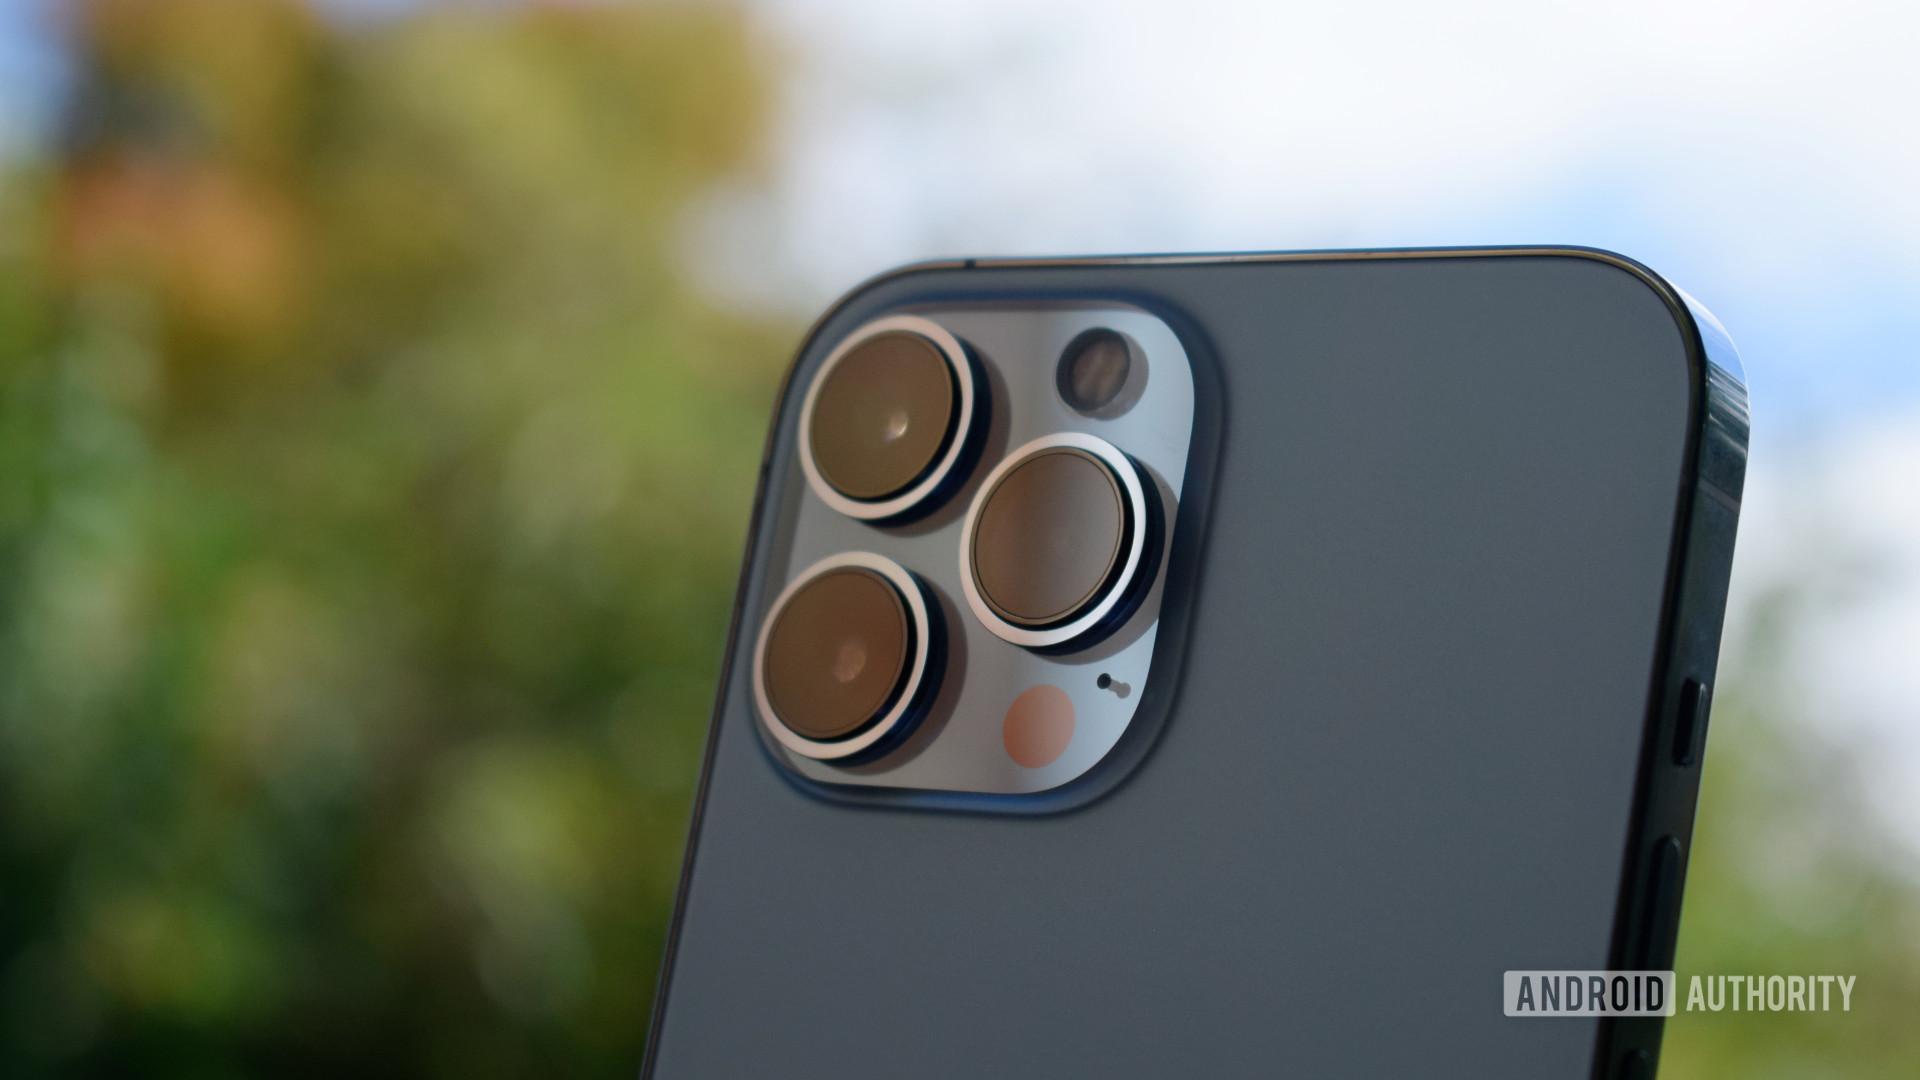 Apple iPhone 13 Pro Max camera closeup sky - The best camera phones